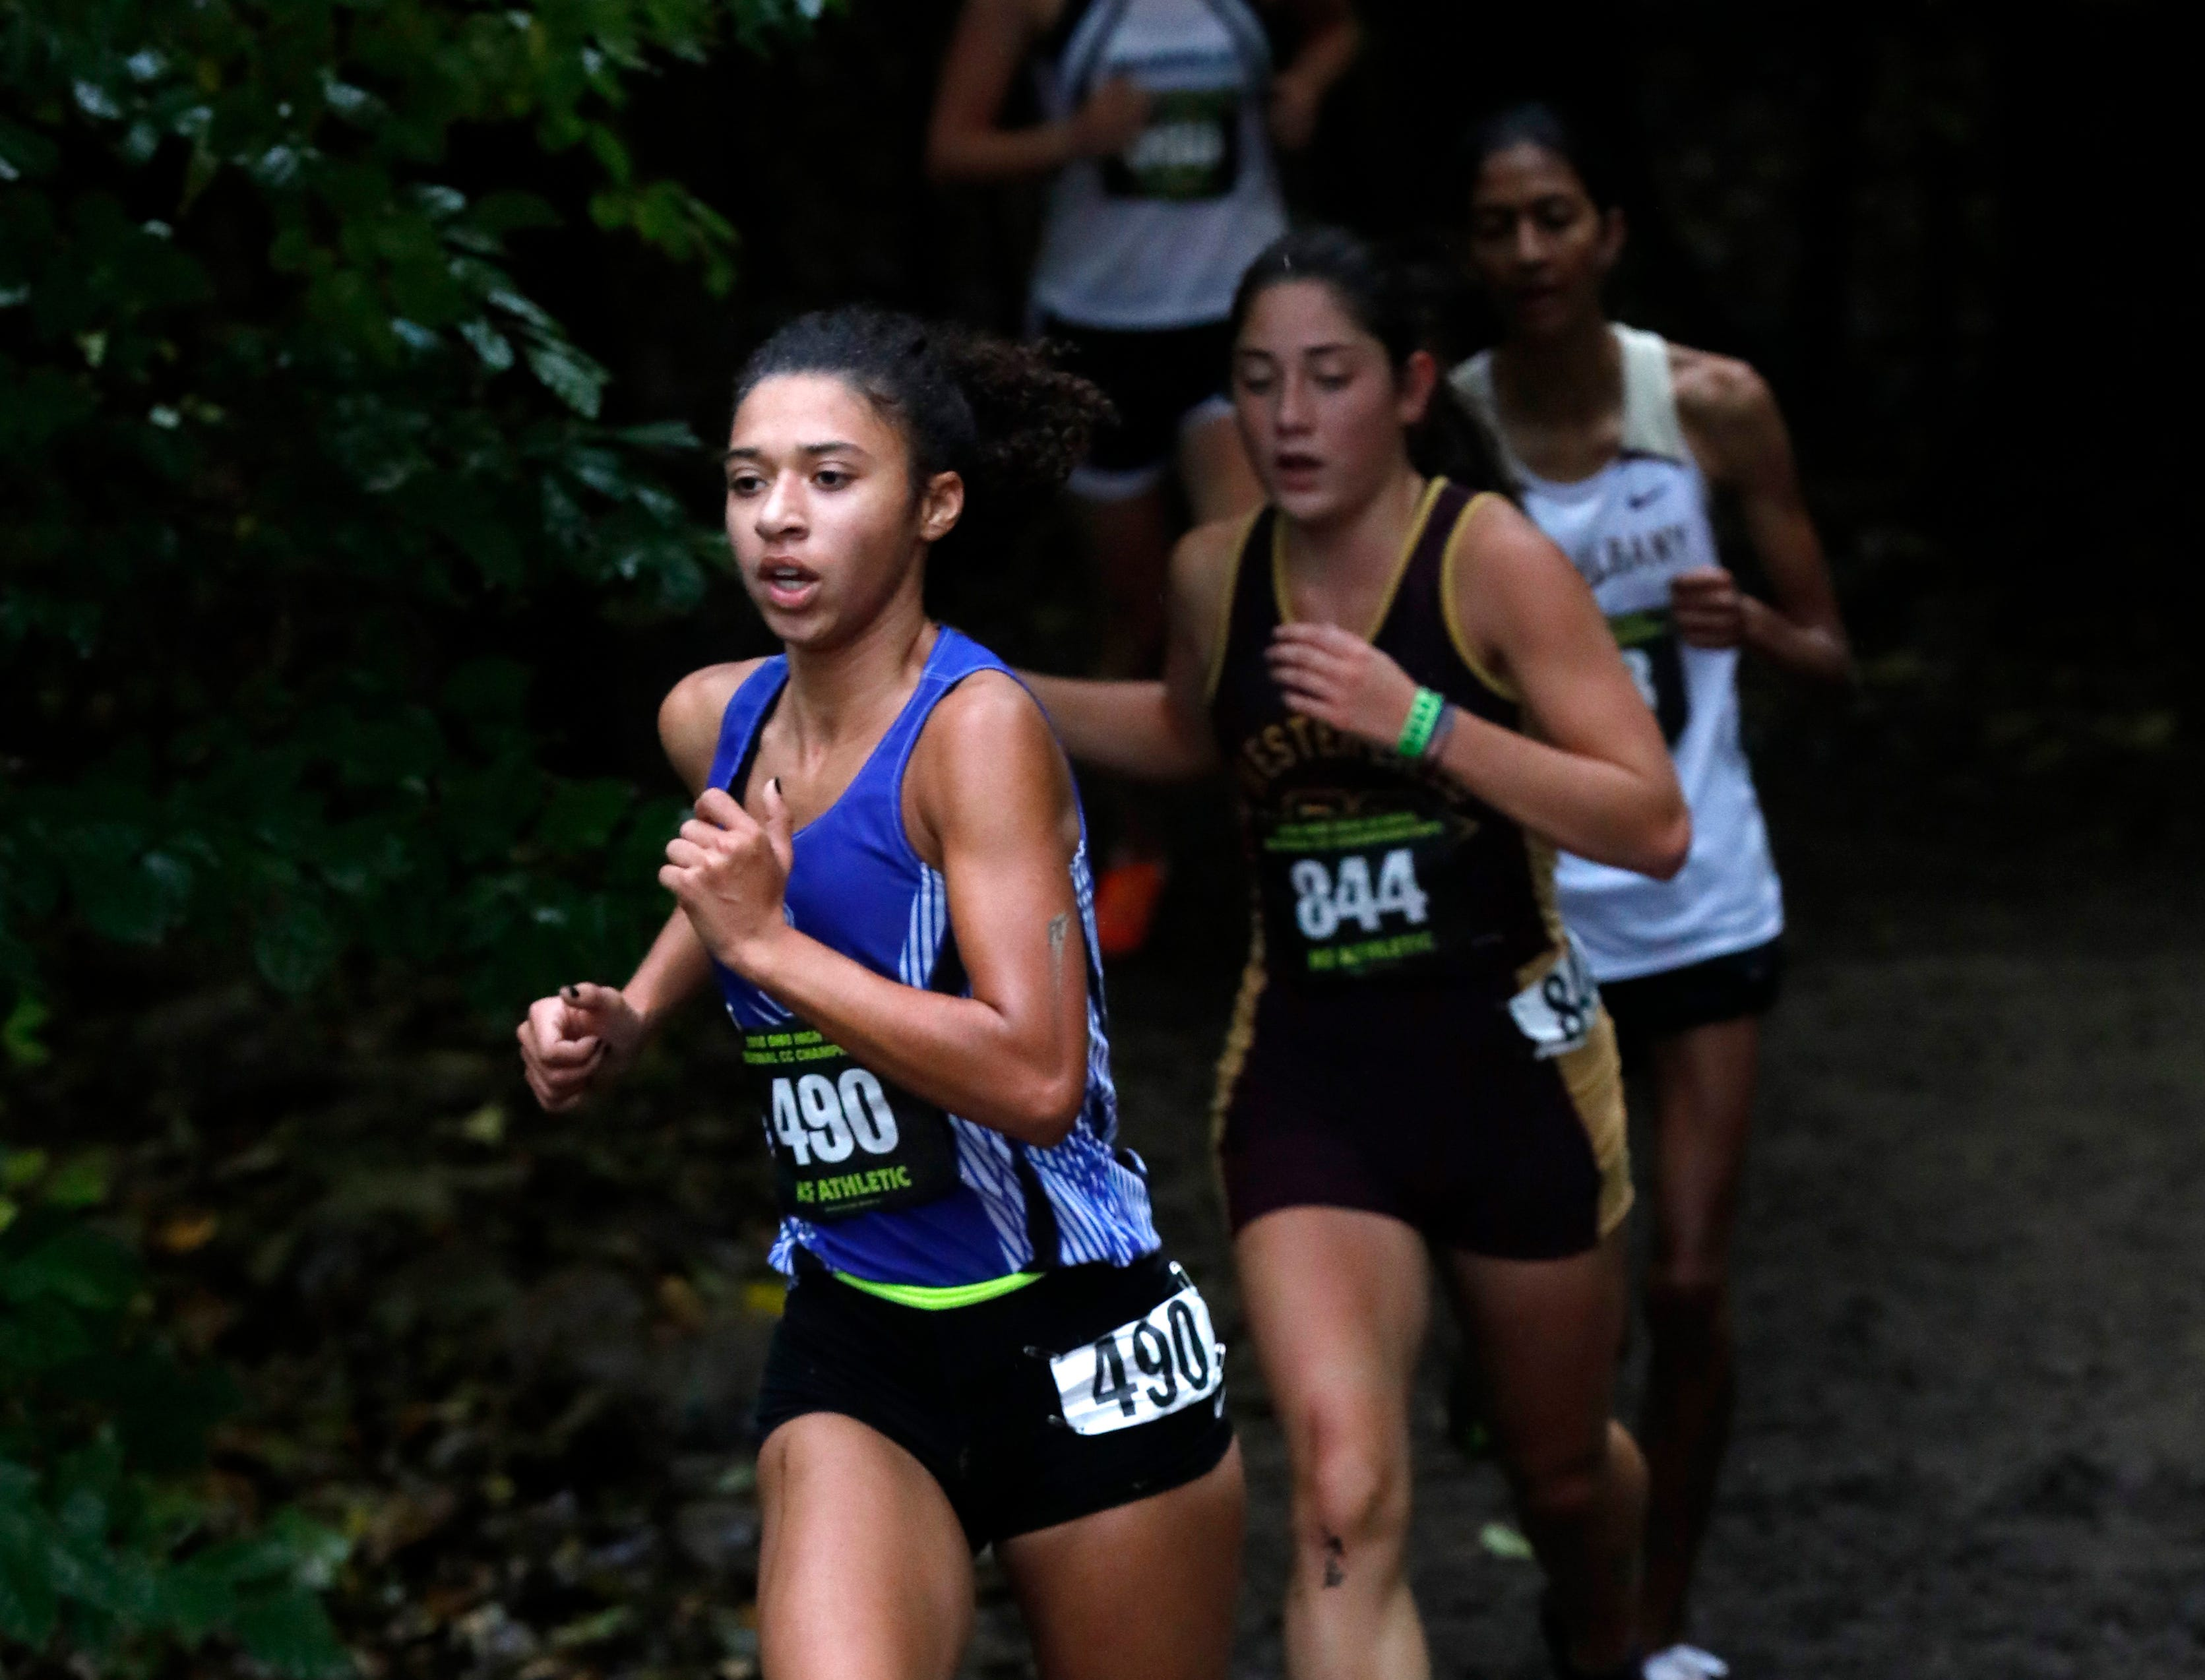 Chillicothe's Danielle Fleurima runs in the Regional Cross Country meet Saturday, Oct. 27, 2018, at Pickerington North High School in Pickerington.